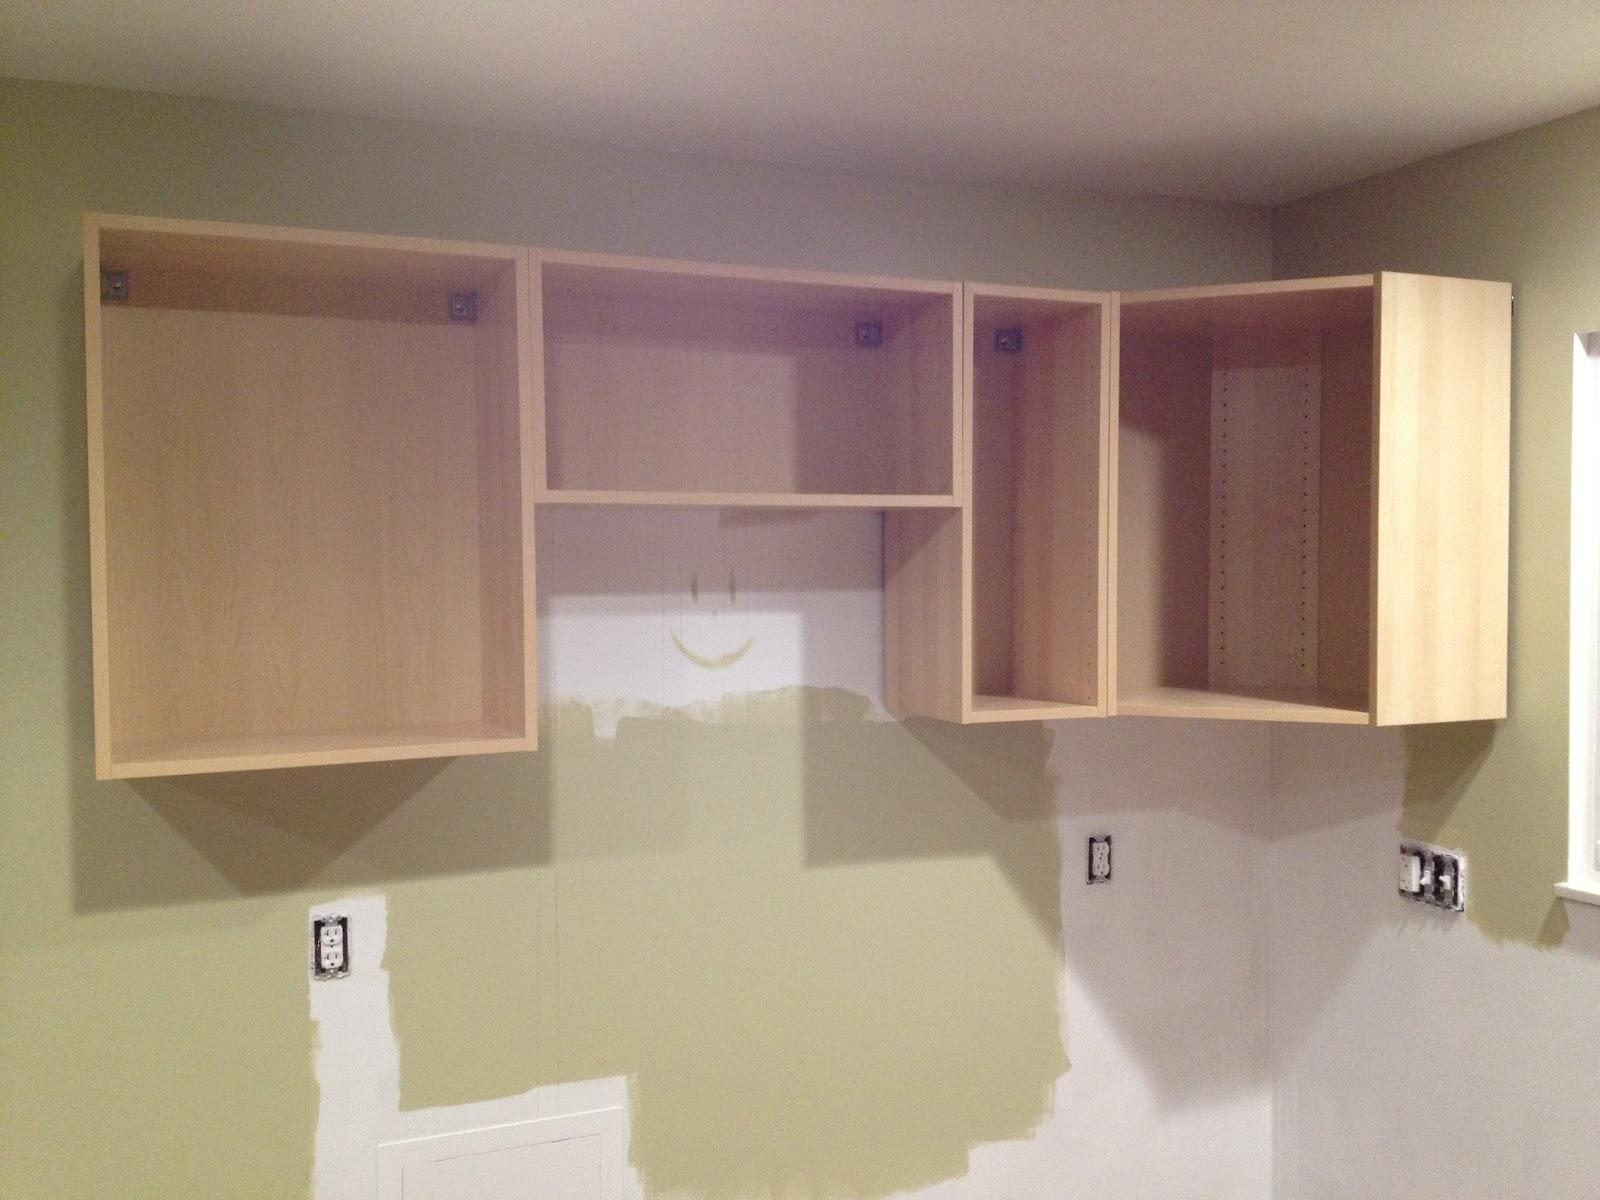 Our IKEA Kitchen: September 2012